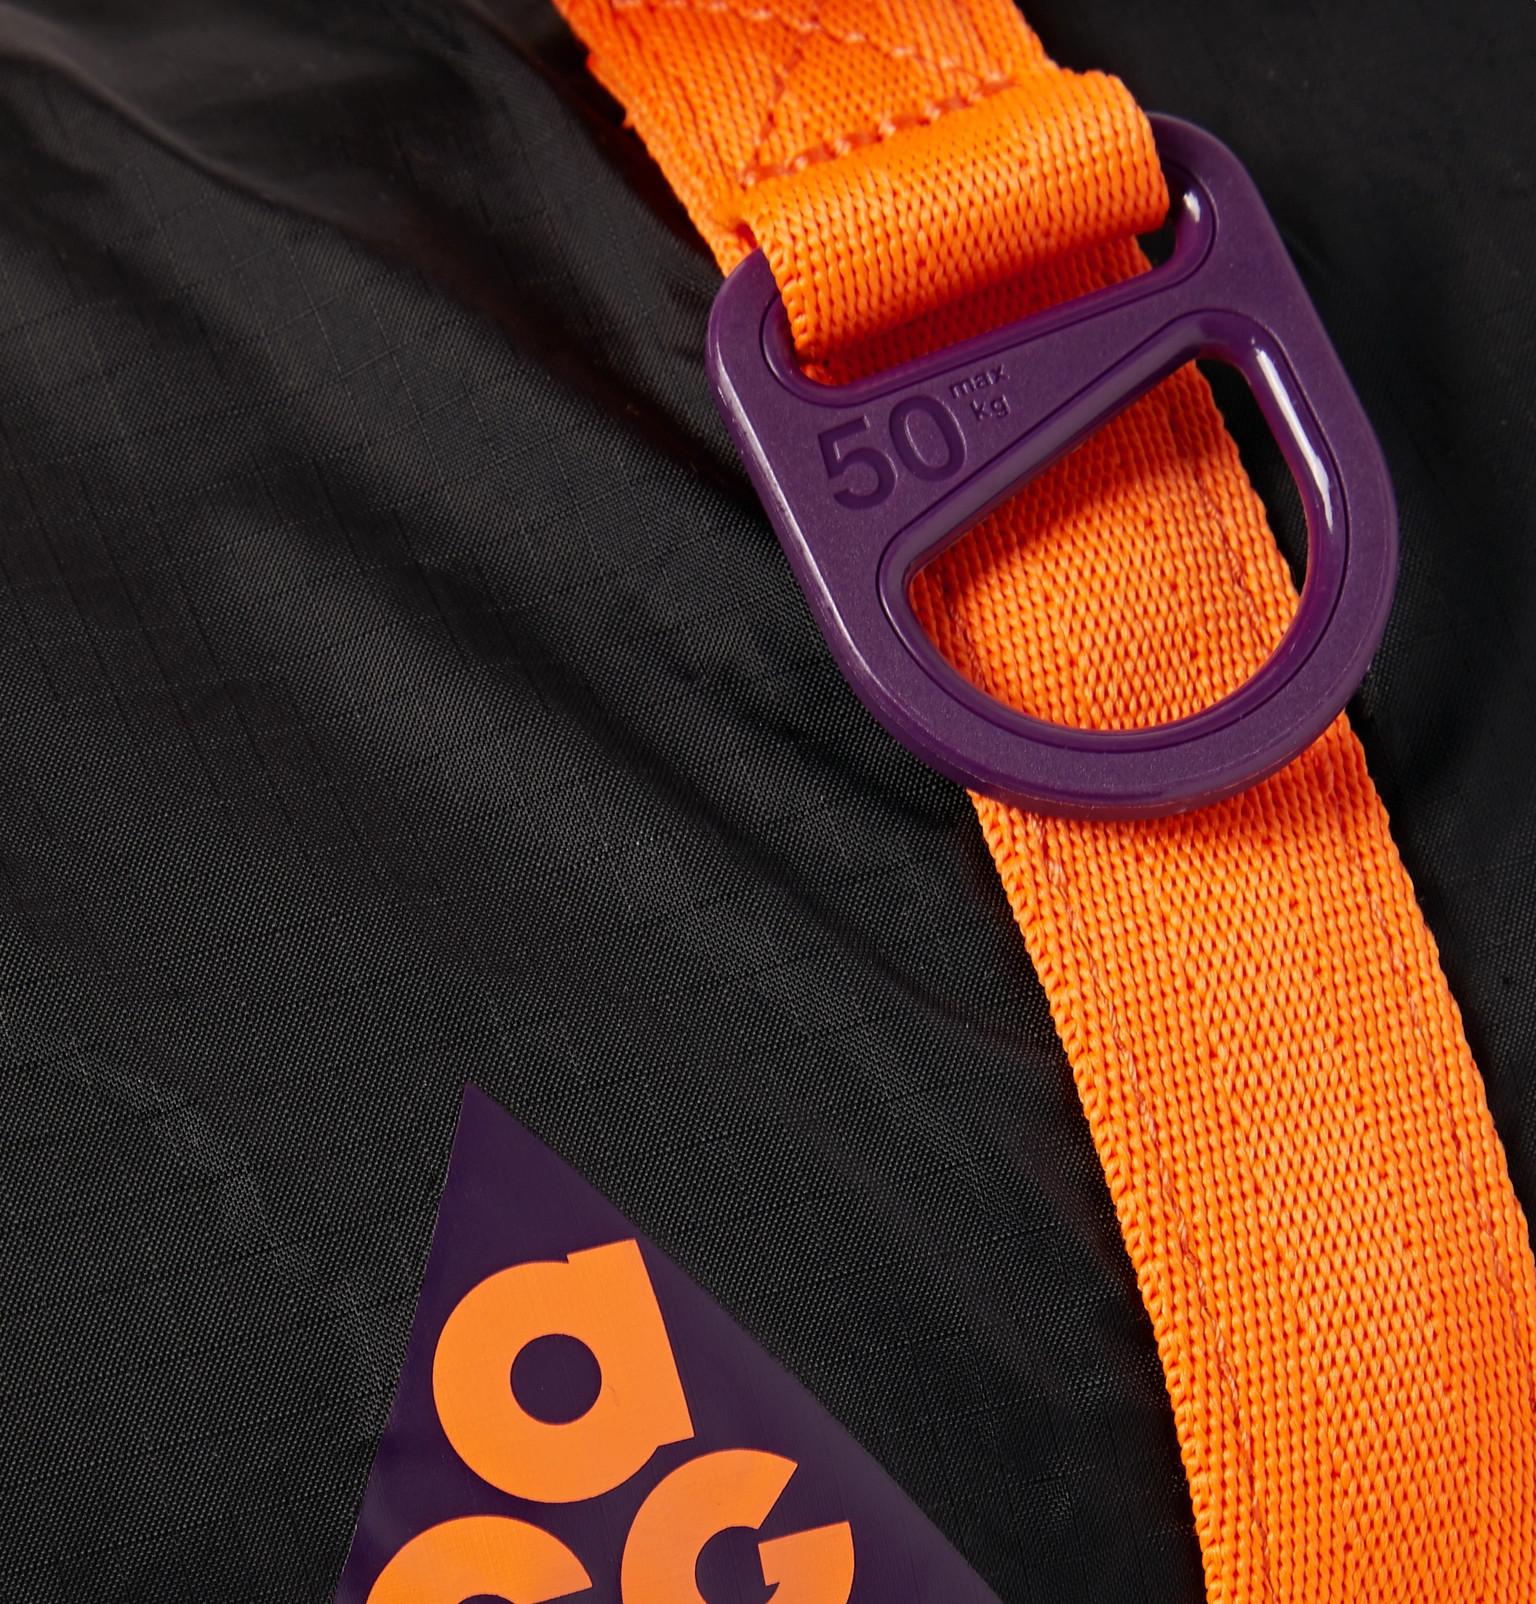 087c7652dafa Nike - ACG Packable Ripstop Duffle Bag